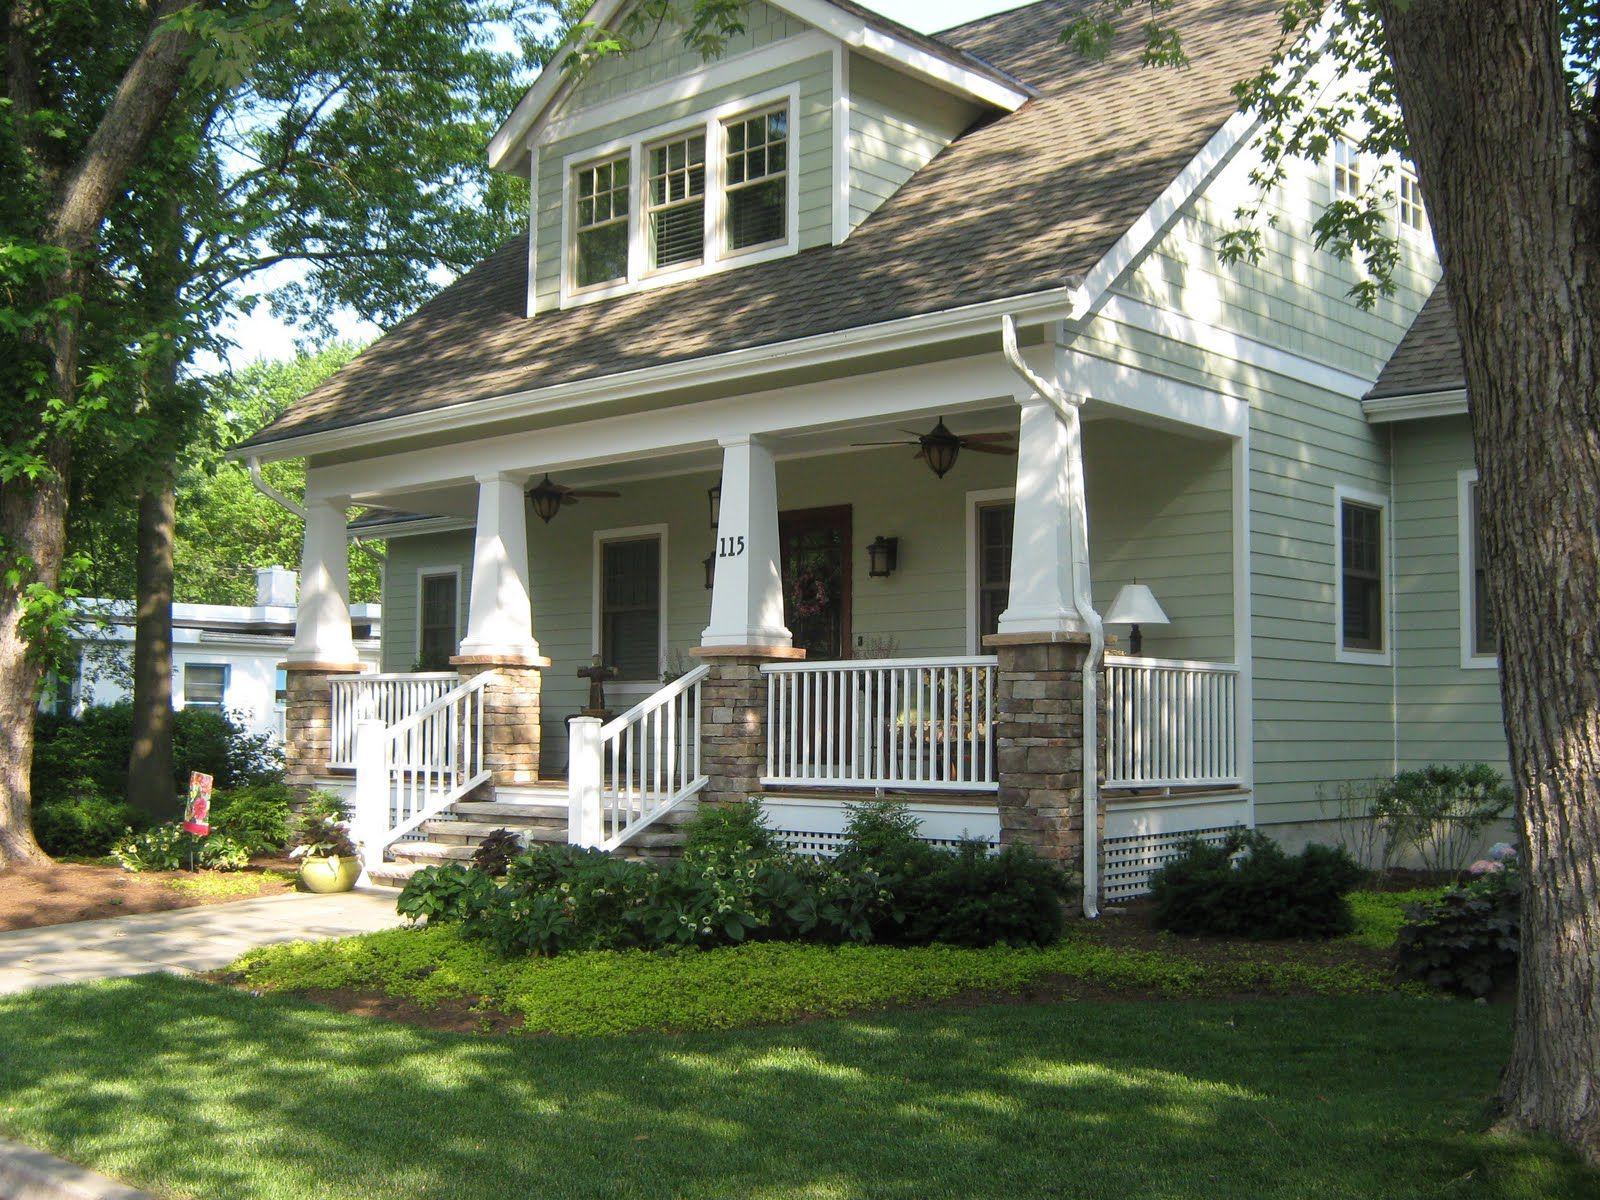 A Craftsman Bungalow Cottage I Did It All 3 Styles In: 2.bp.blogspot.com _g1Em5-dORLY TAKCZGNhBeI AAAAAAAAAu4